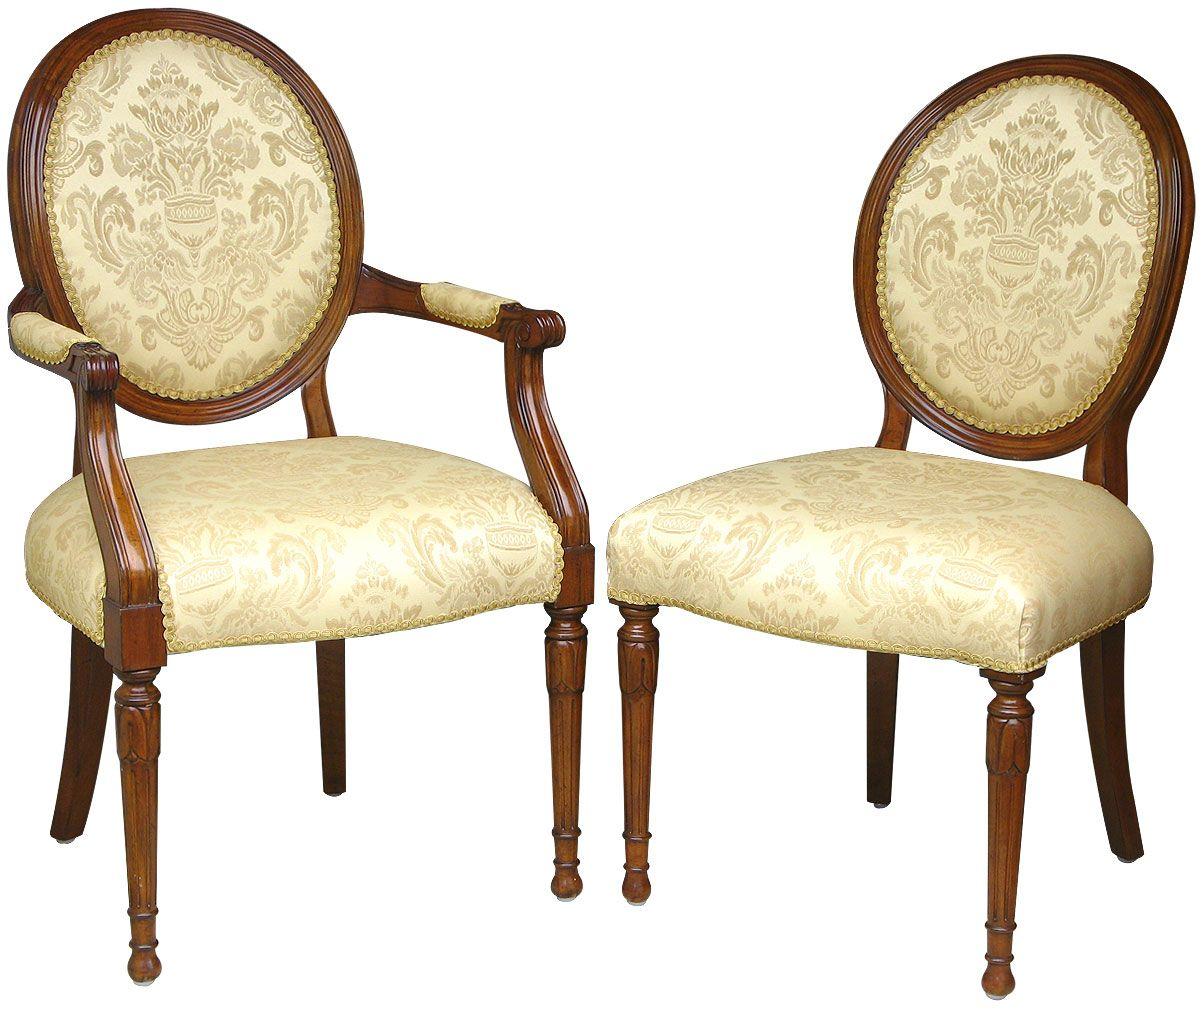 Antique Victorian Furniture - Antique Victorian Furniture Muebles: Históricos Pinterest